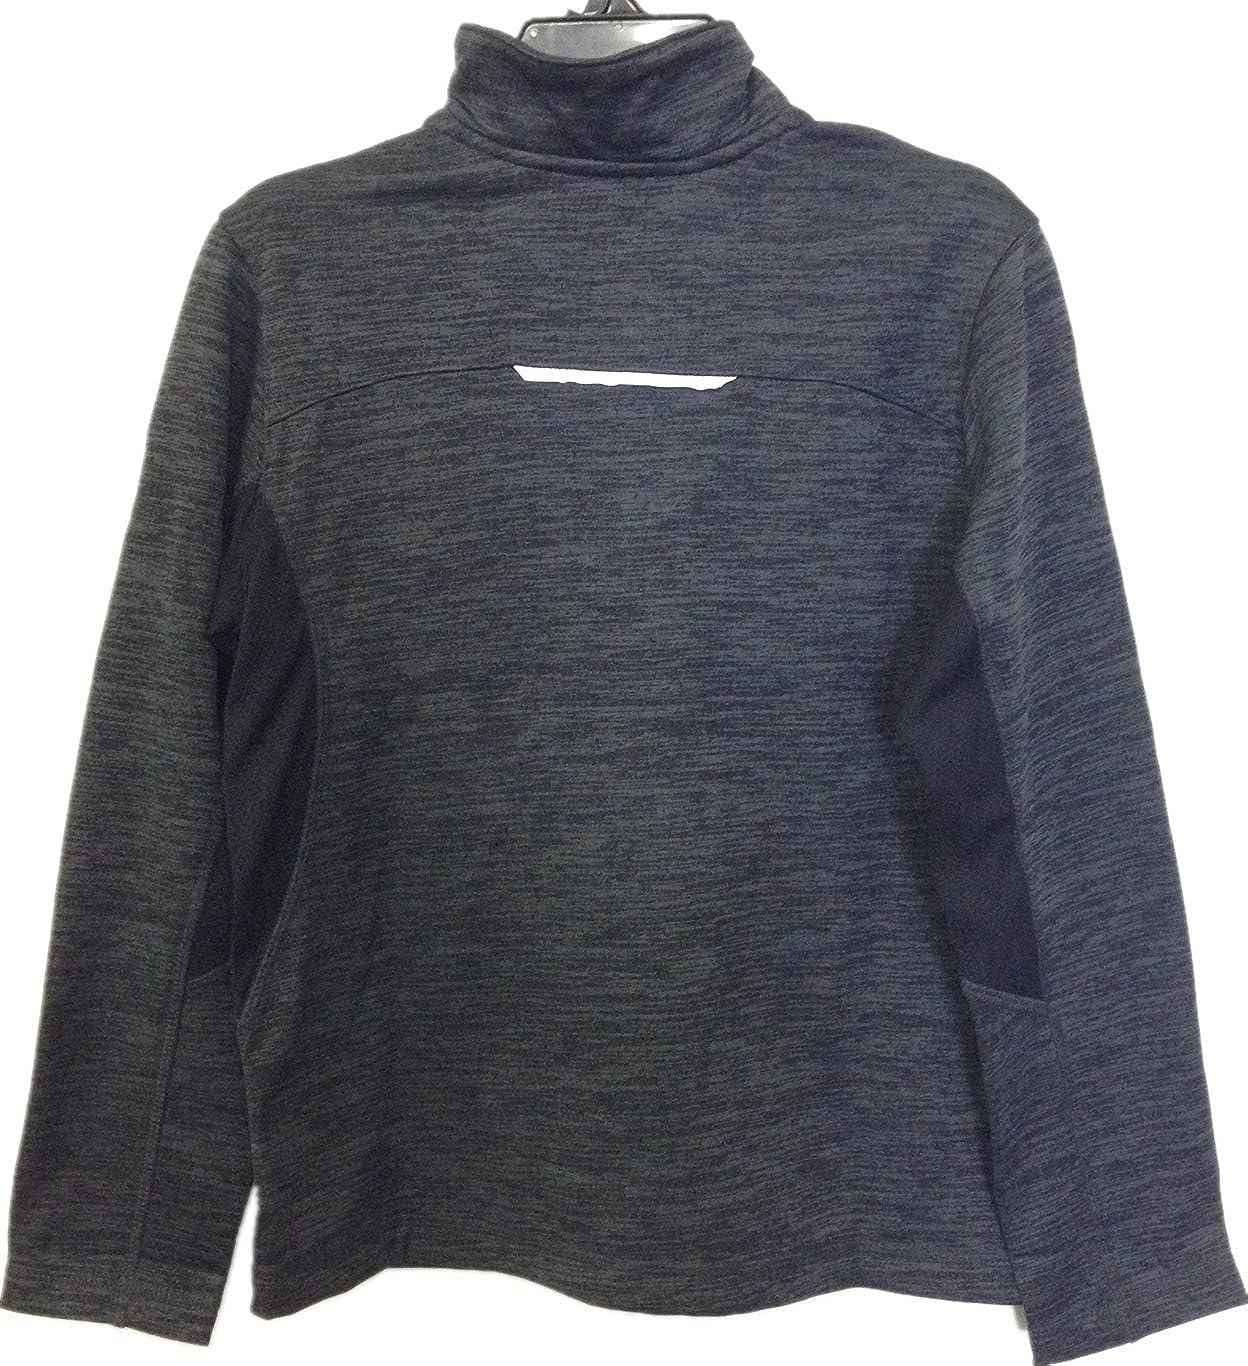 10//12 Dk Htr, Medium Gerry Boys Light Weight Soft Jacket